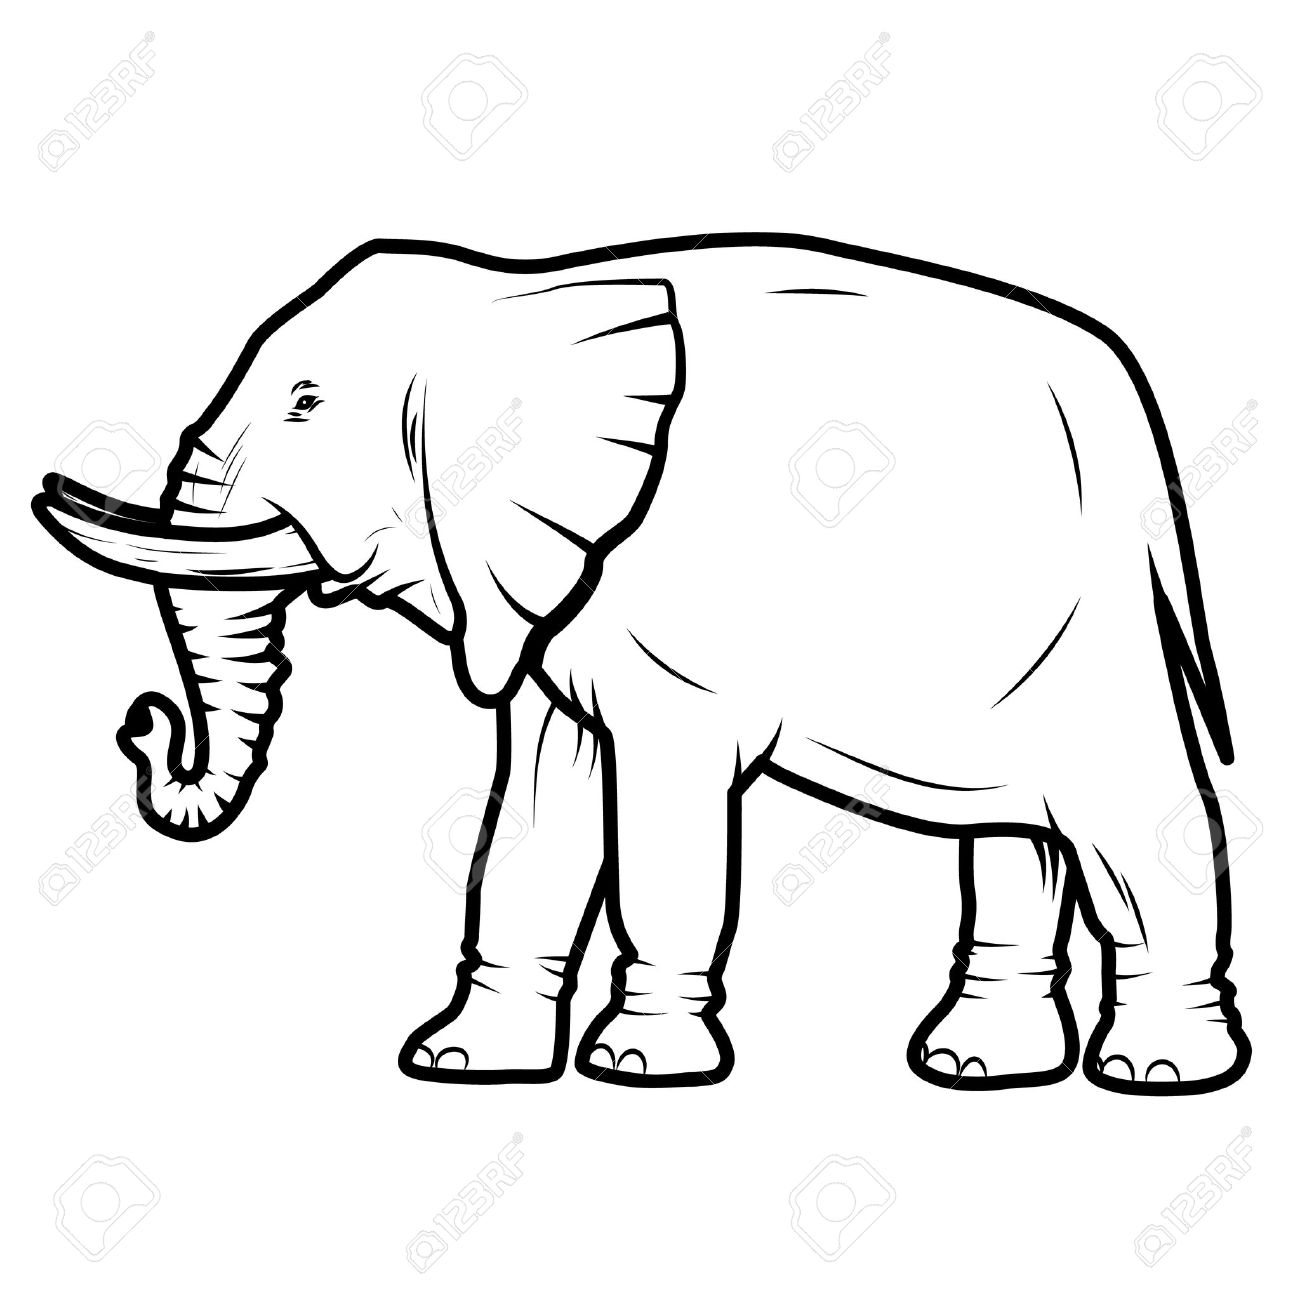 1 618 elephant logo stock illustrations cliparts and royalty free